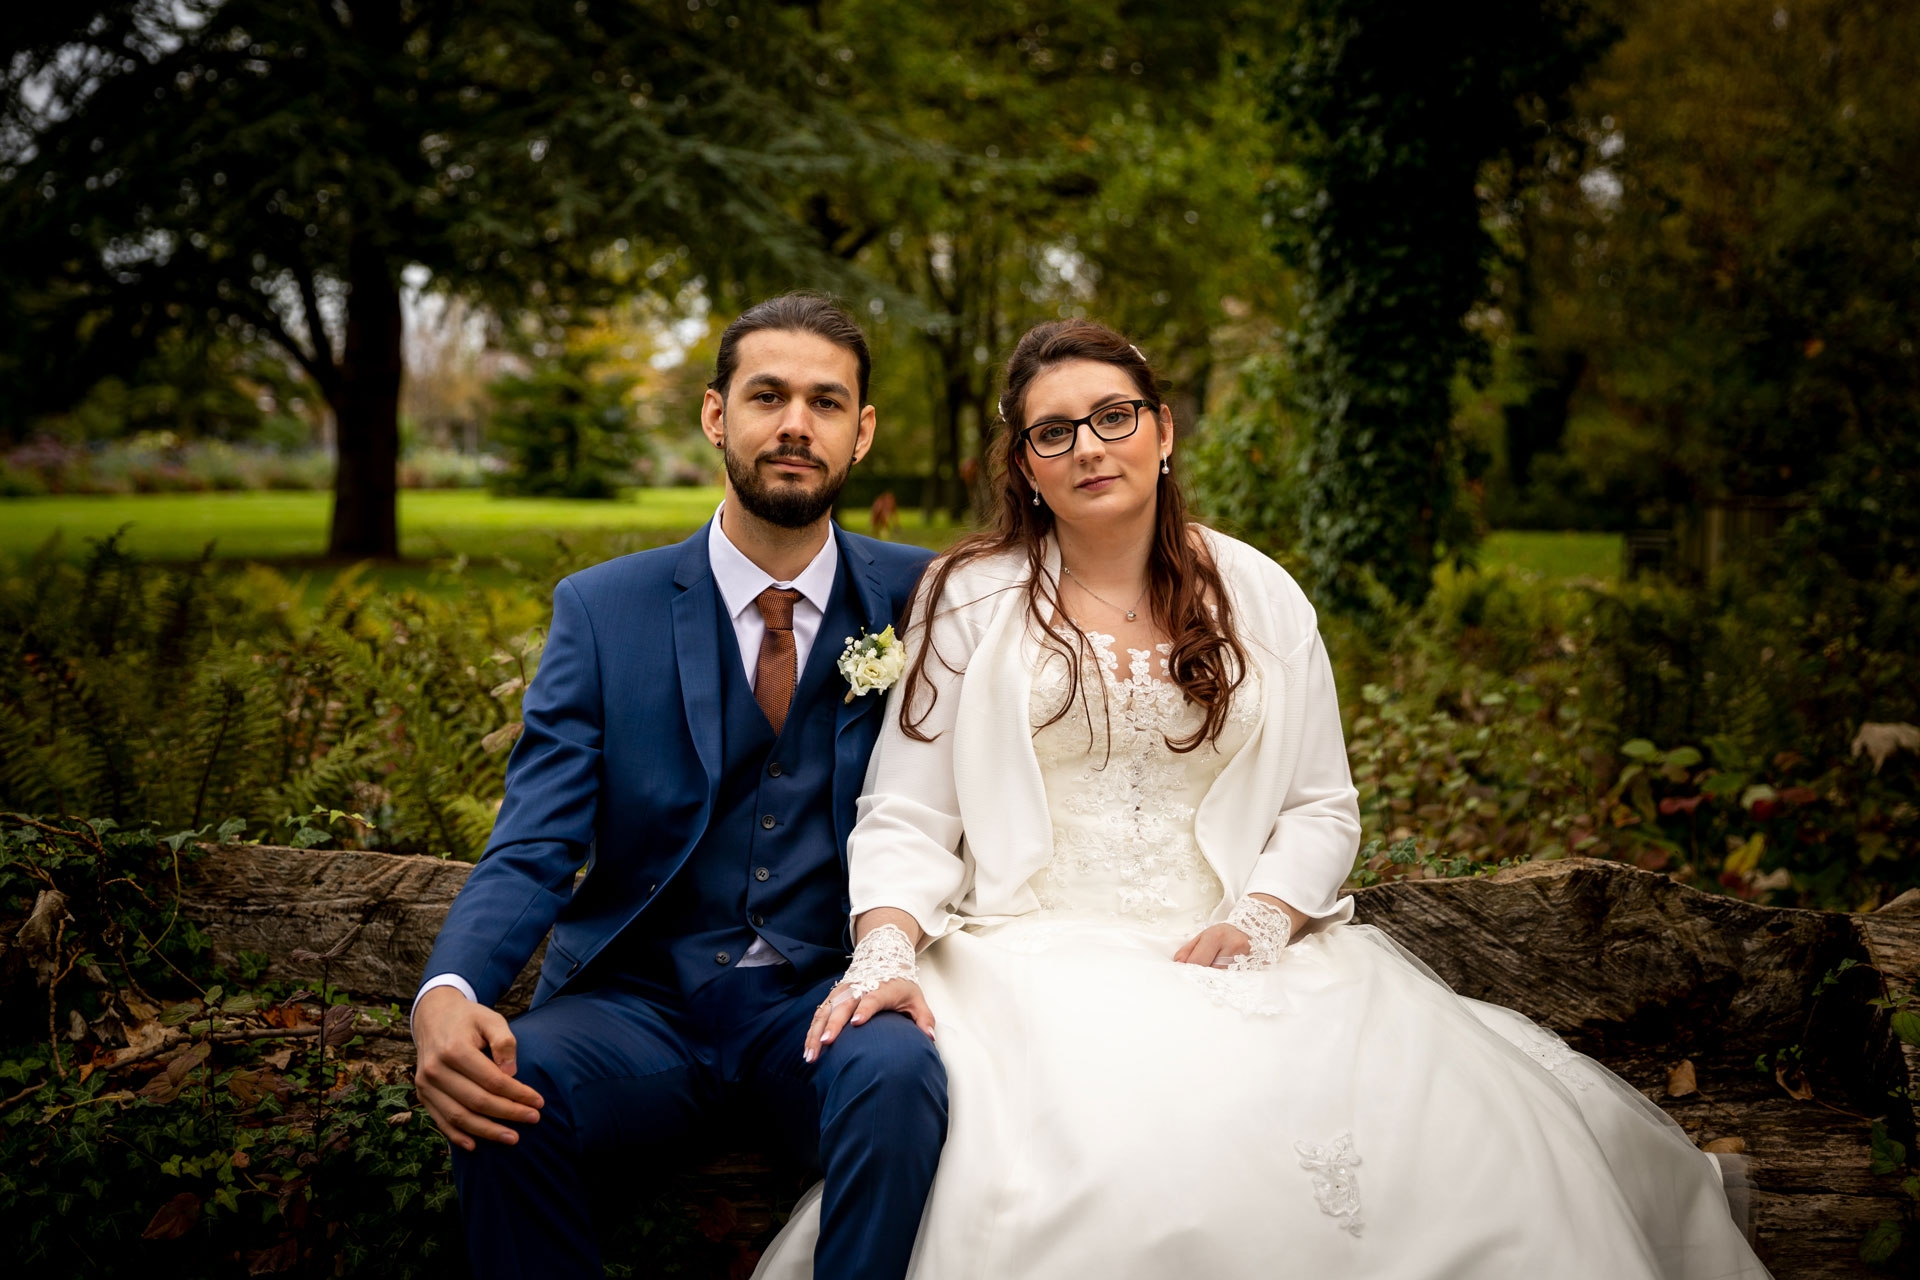 20201017-mariage-justine-alexandre-45